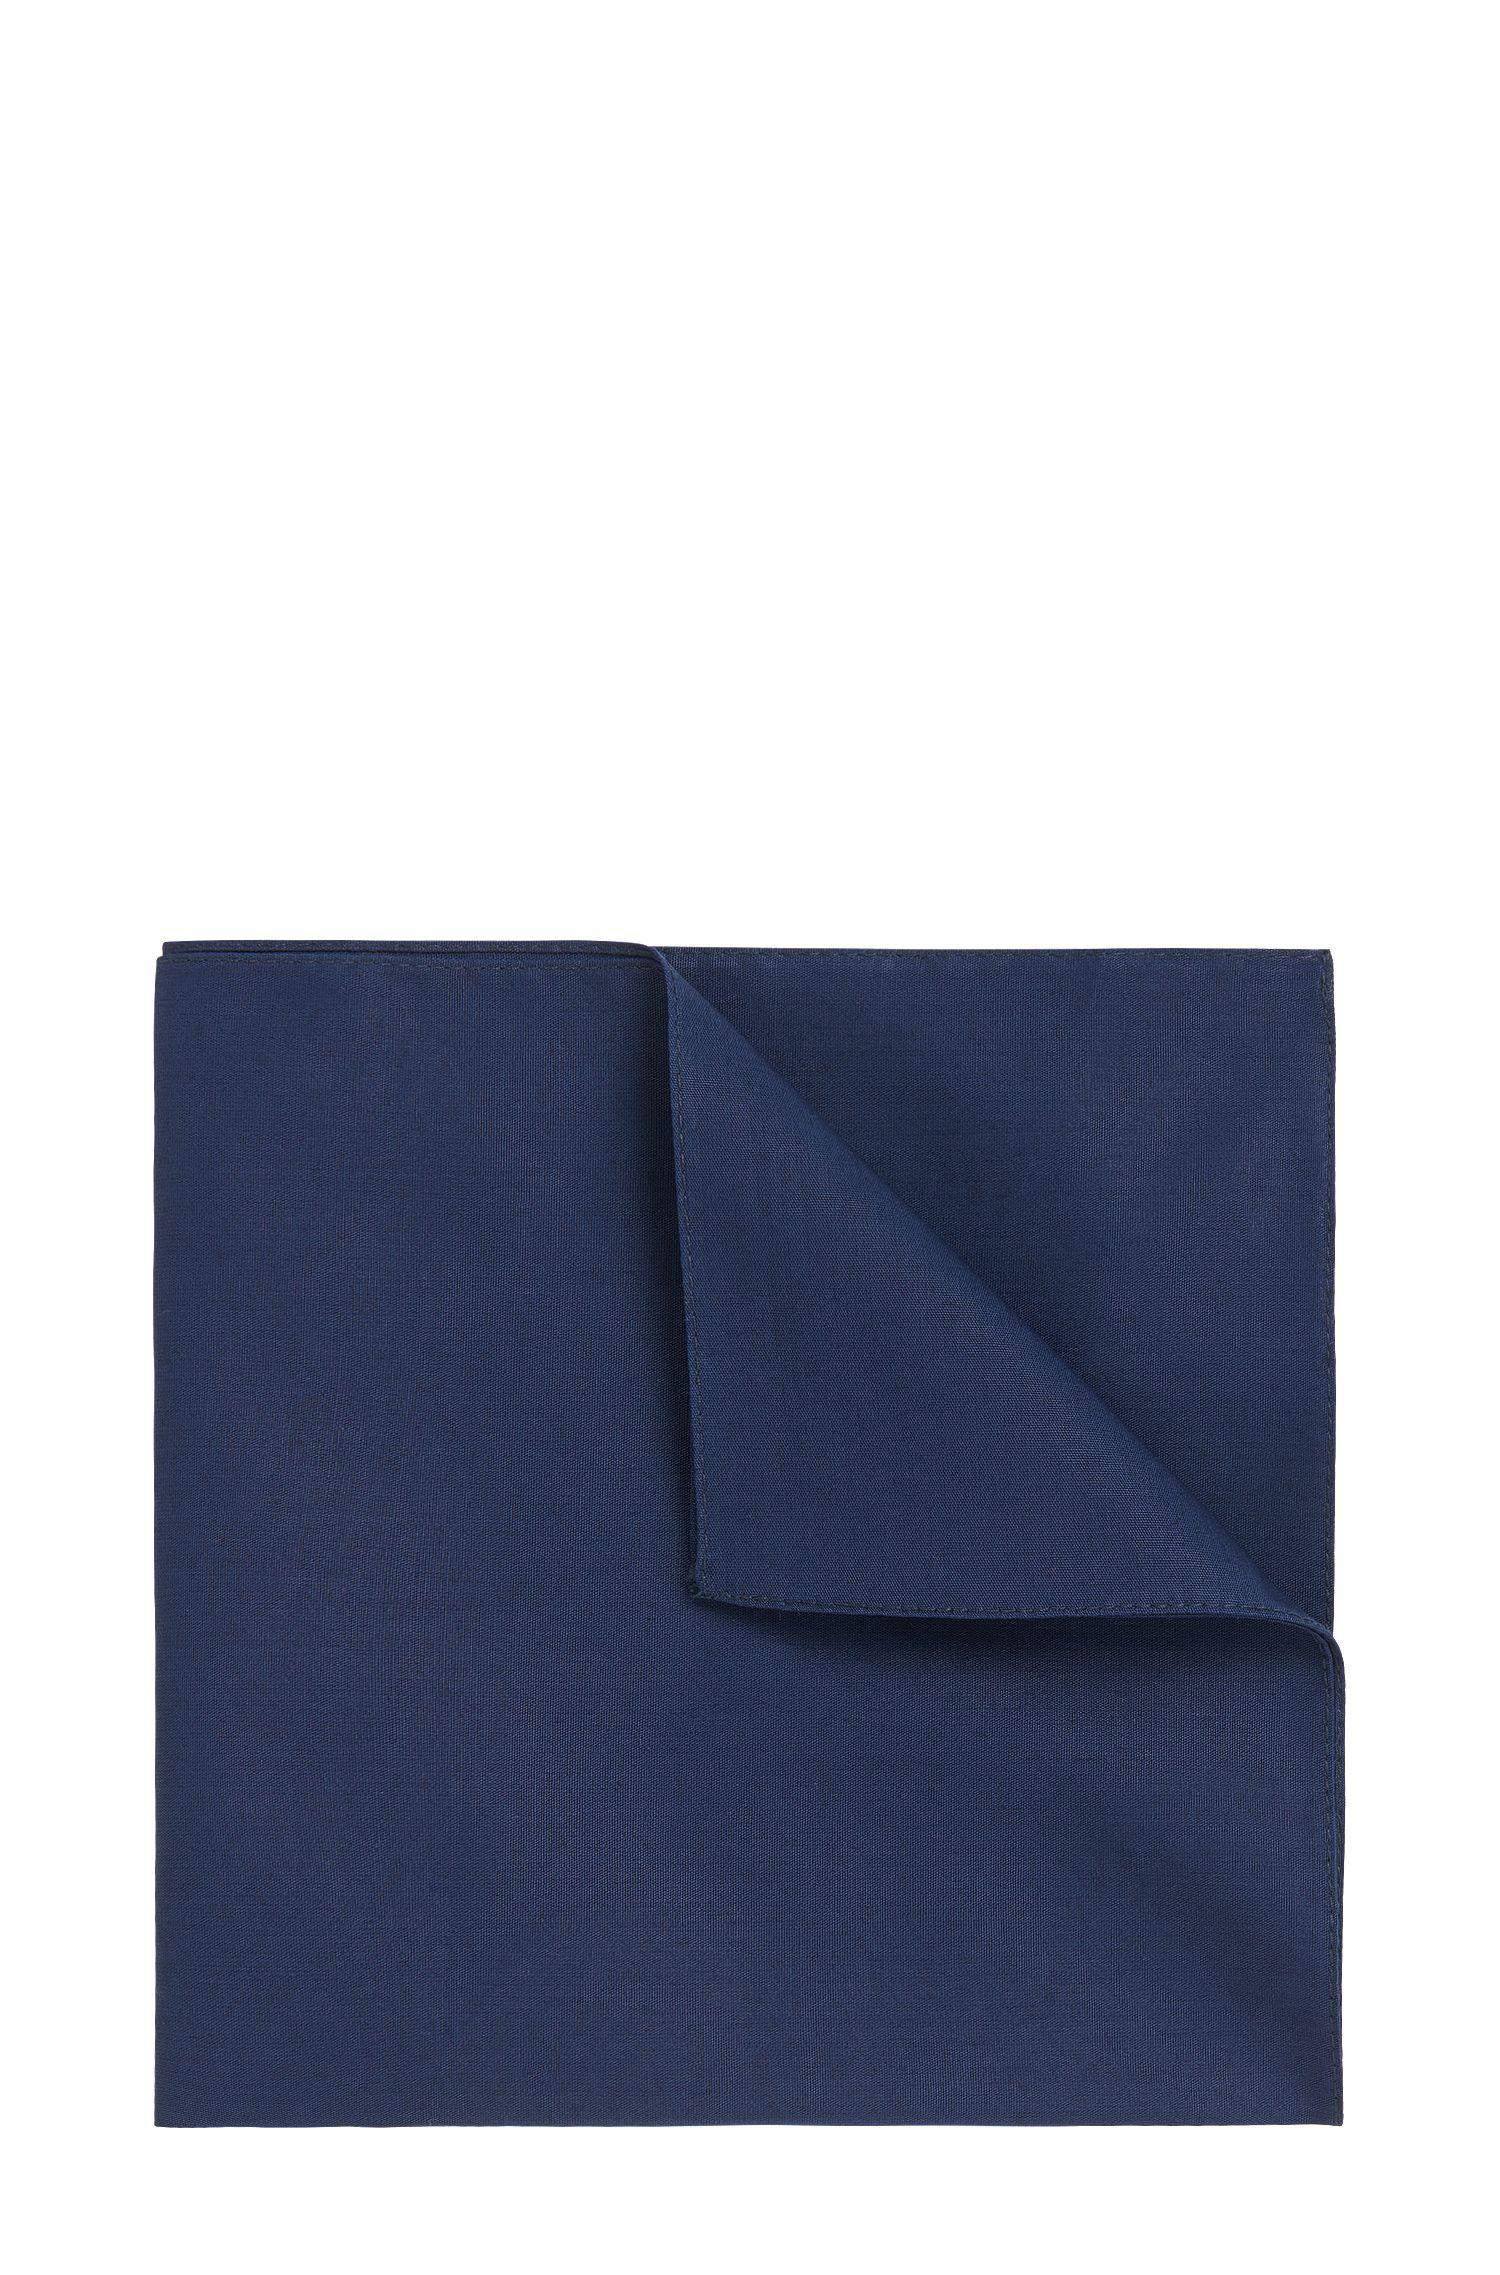 Effen pochet van zuivere katoen: 'Pocket square 33x33'